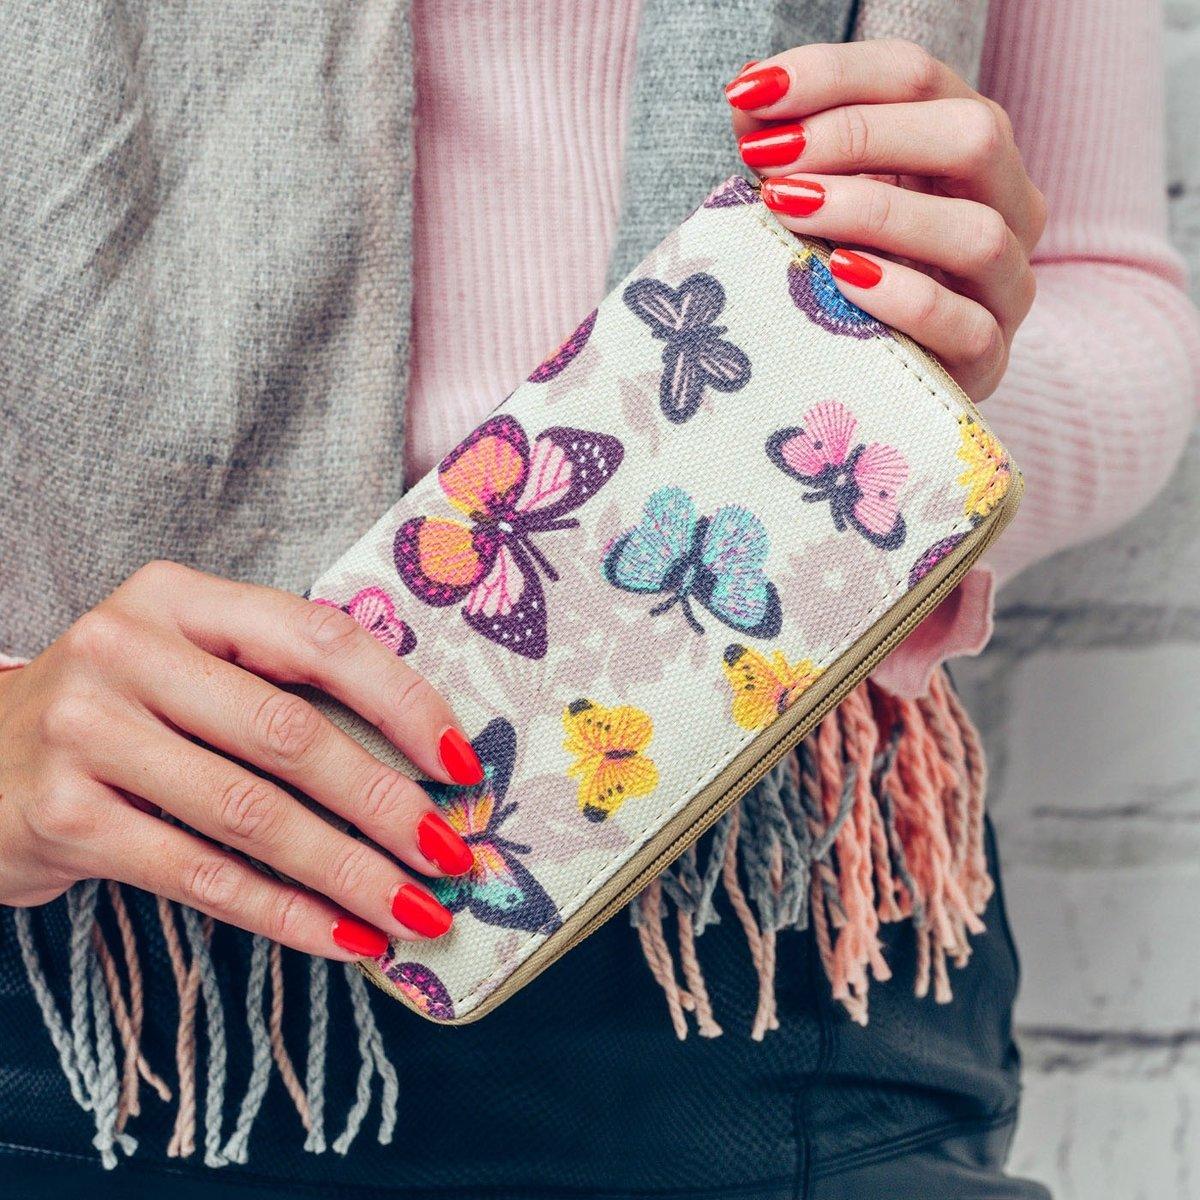 507dd3f4881 bol.com | Hazel & Pip VLINDERS Patroon Canvas Strandtas Shopper met bijpassende  Portemonnee Vlinder